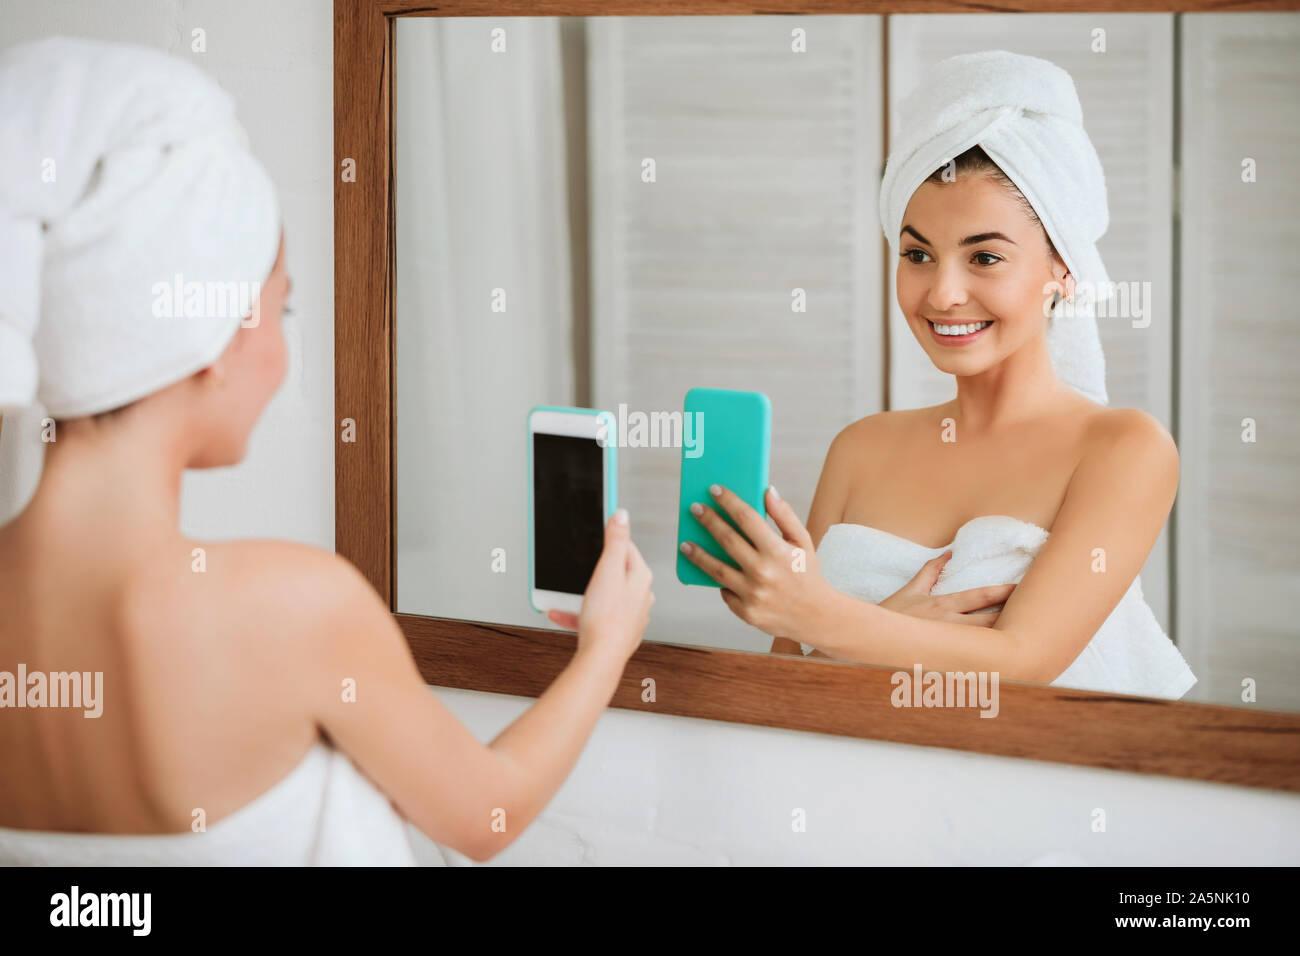 Beautiful Happy Woman In Towel Taking Selfie In Front Of Mirror In The Bathroom Stock Photo Alamy